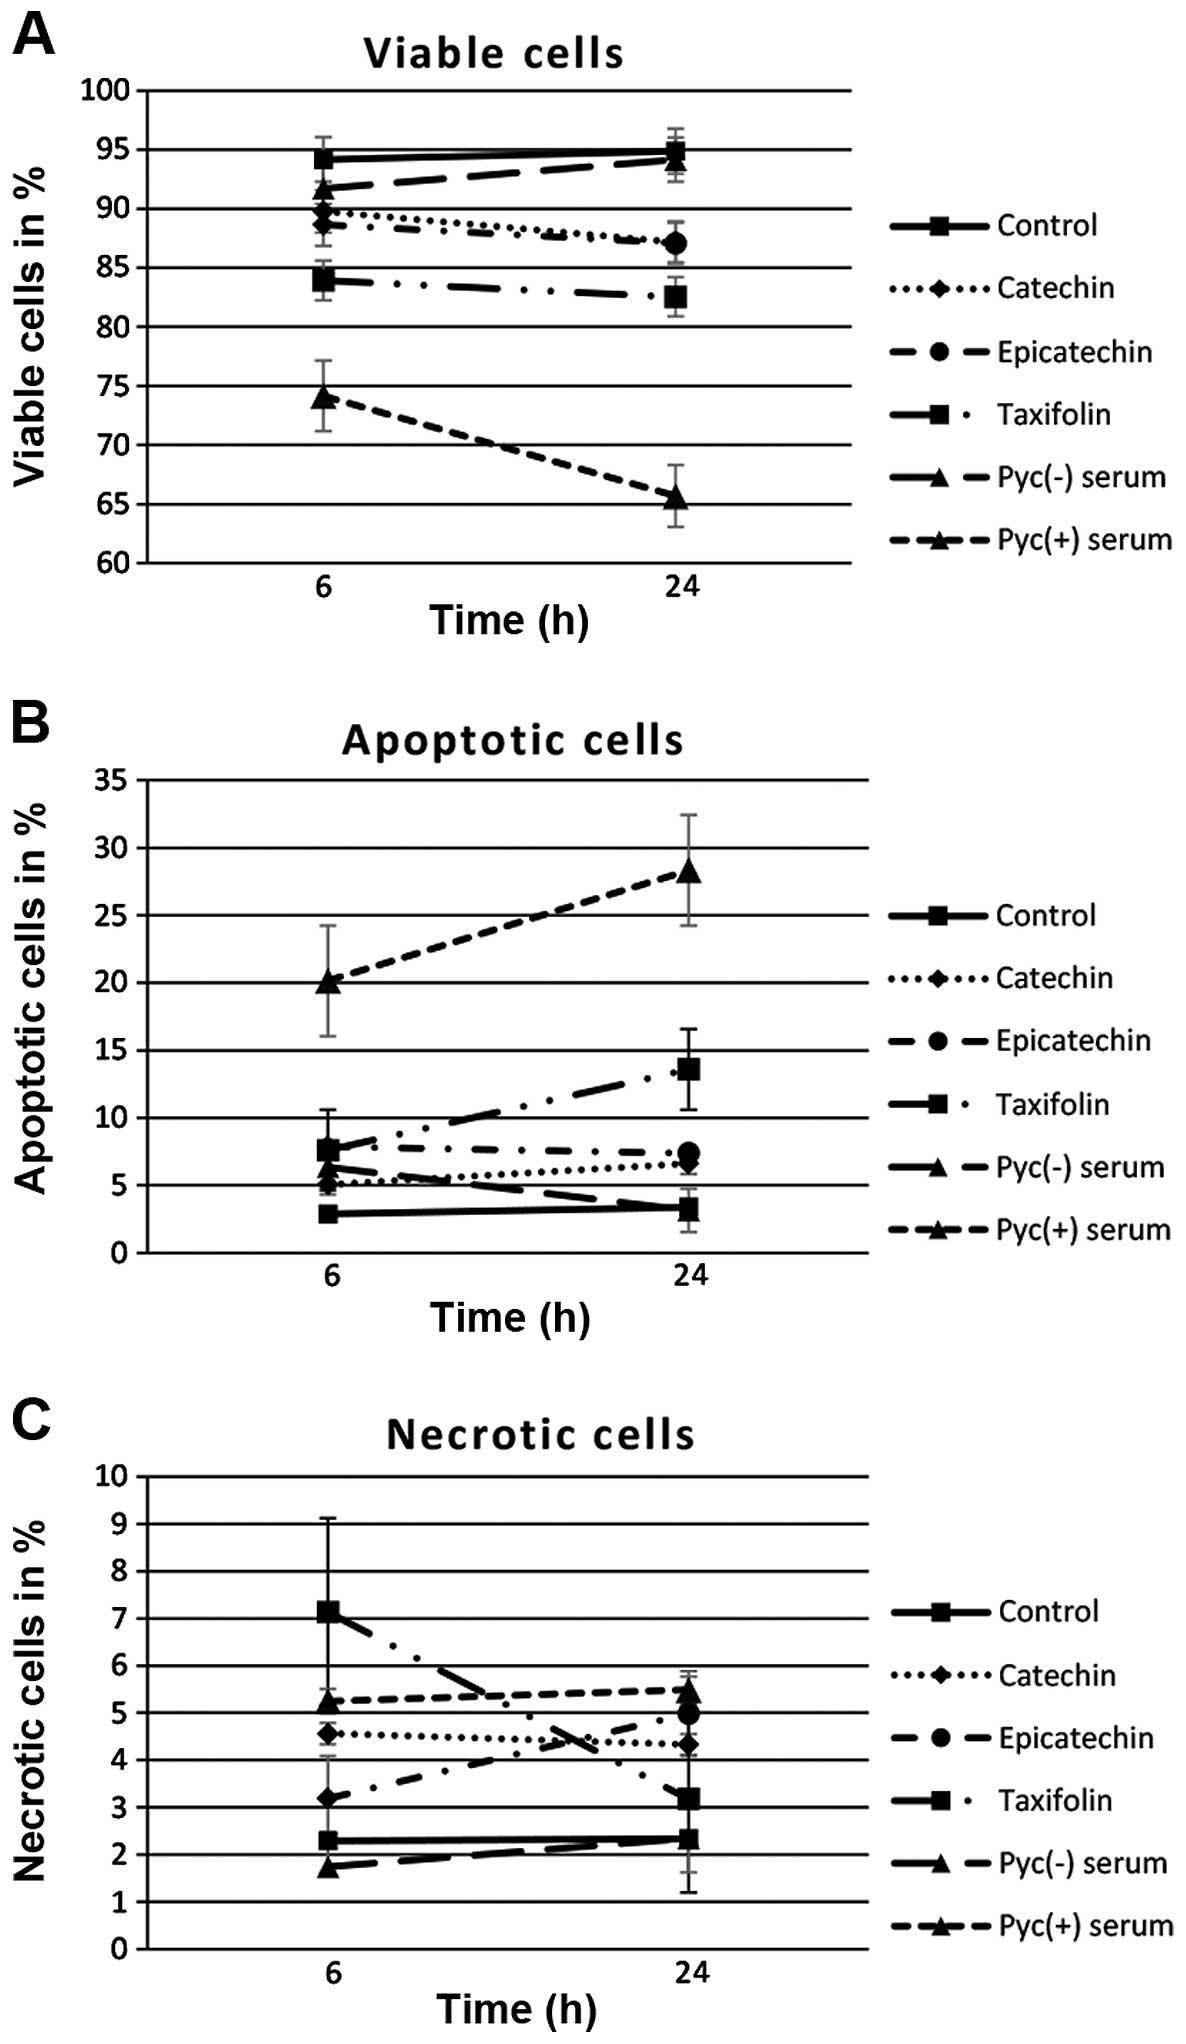 Pro Apoptotic Effects Of Pycnogenol On Ht1080 Human Fibrosarcoma Cells